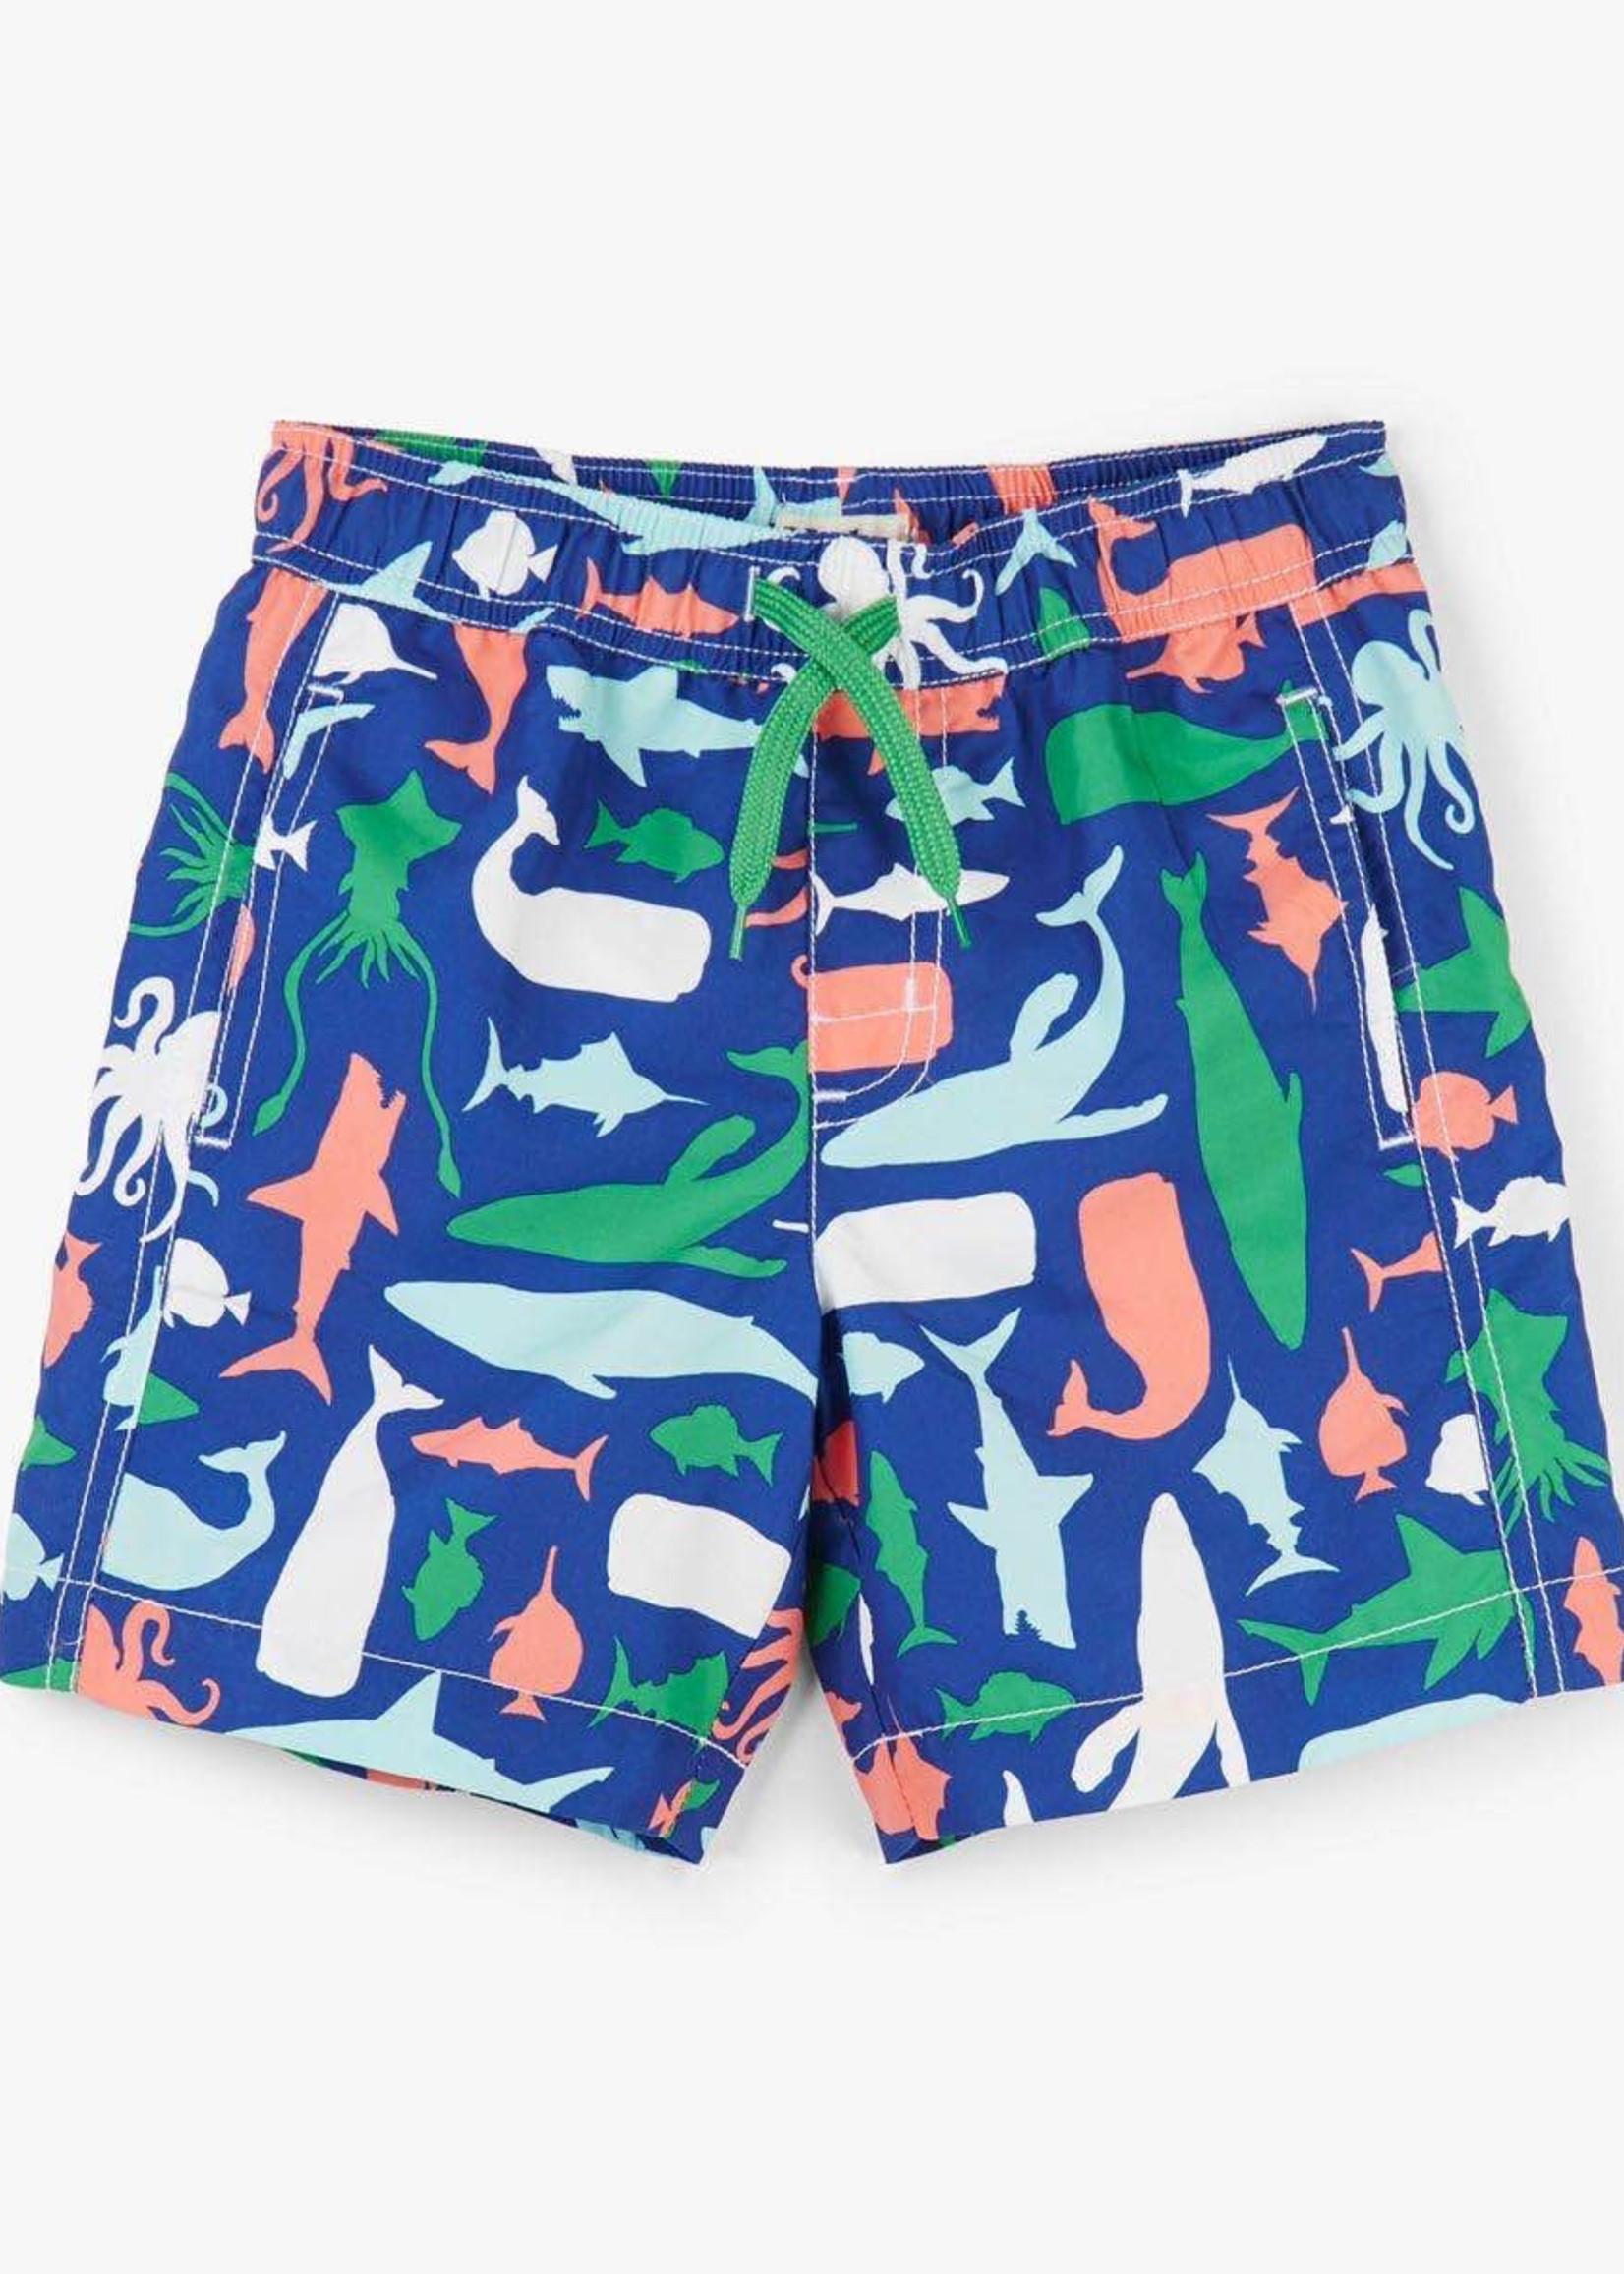 Hatley Hatley Swim Shorts (Sea Creature)